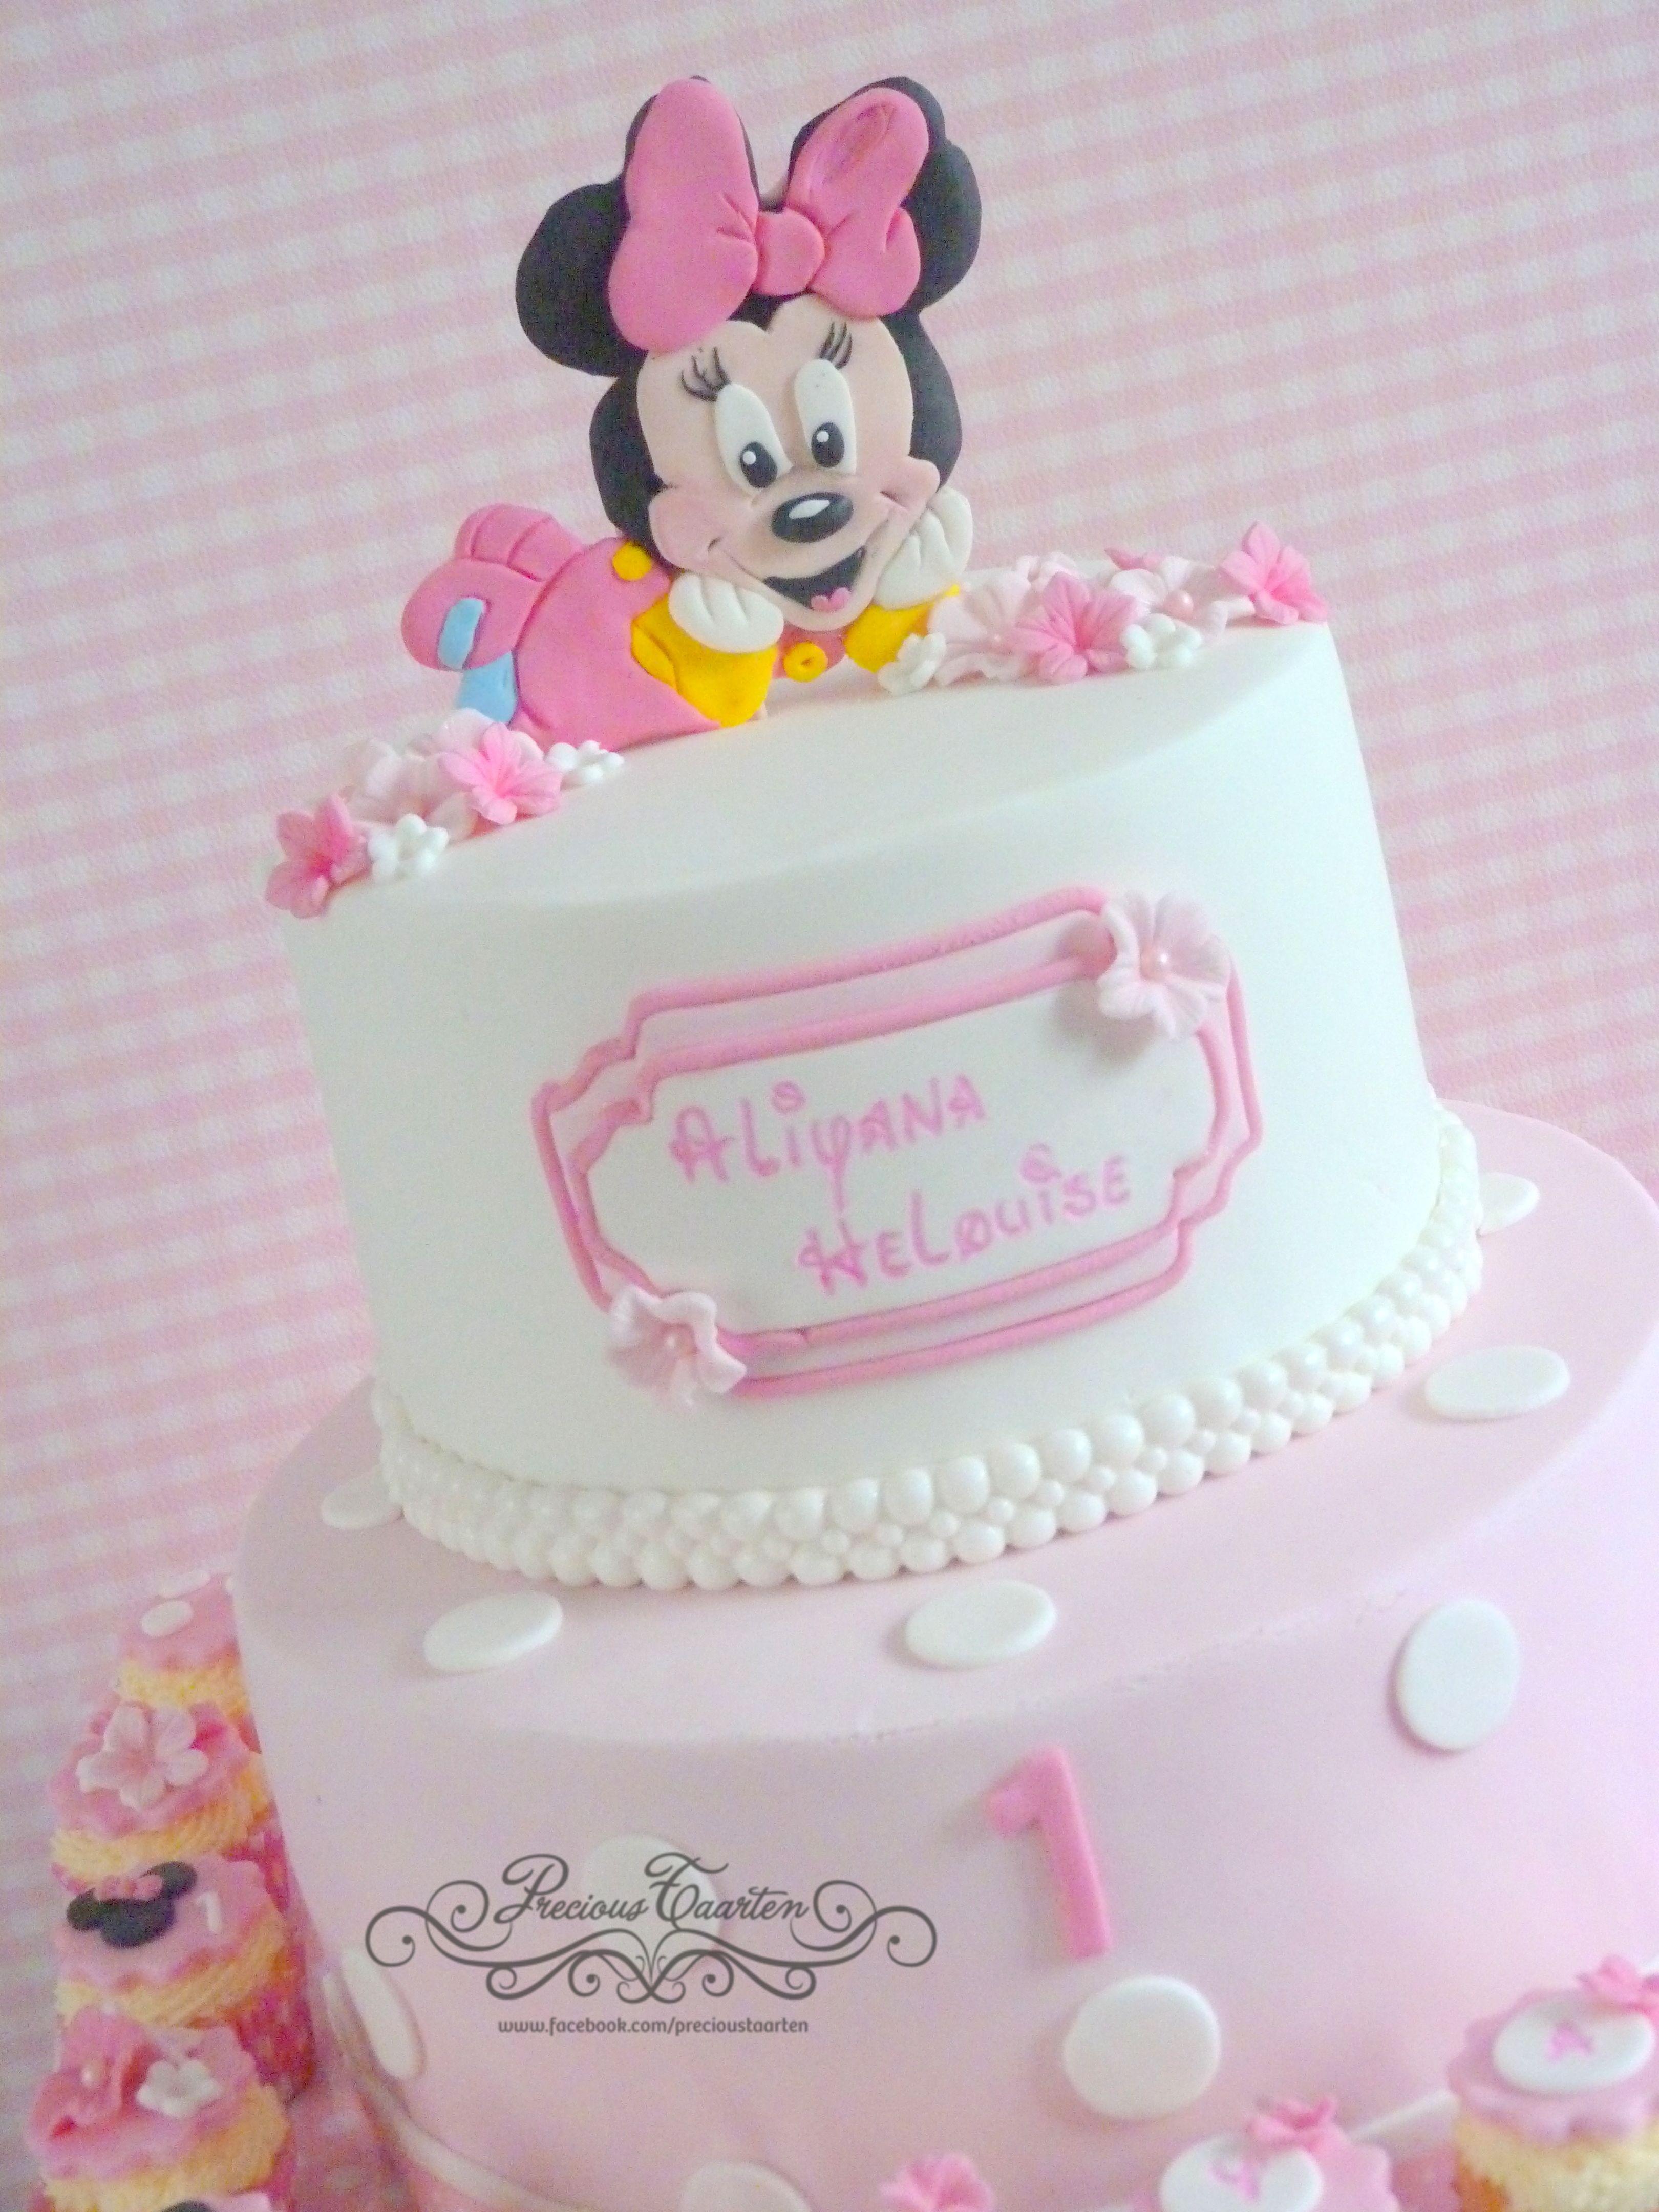 Baby Mini Mouse cake. www.facebook.com/precioustaarten